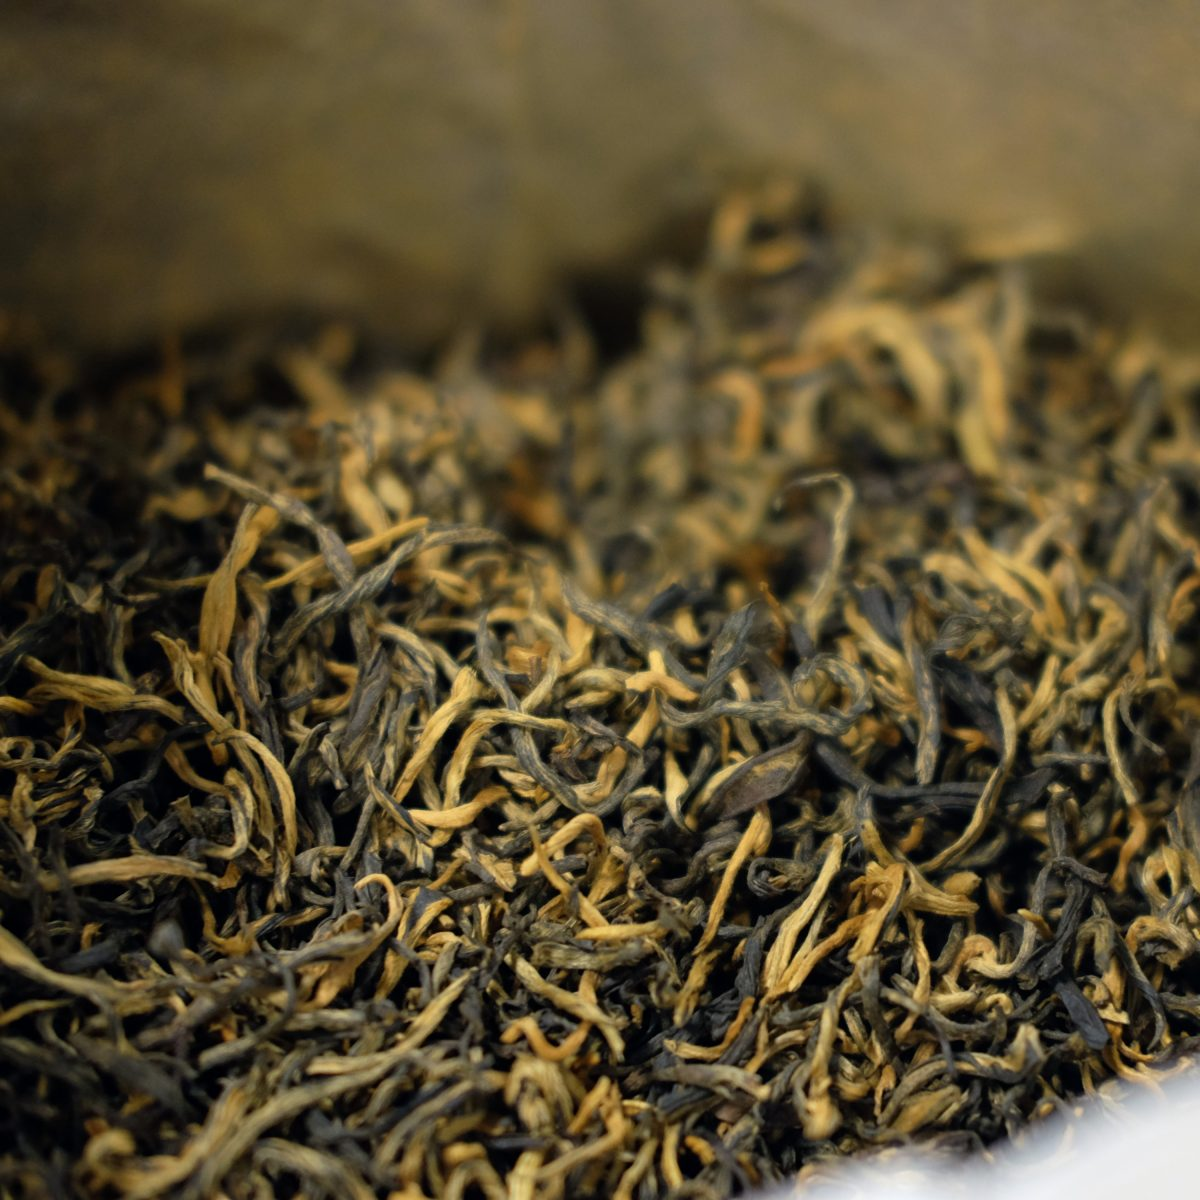 Golden Yunnan Premium the noir